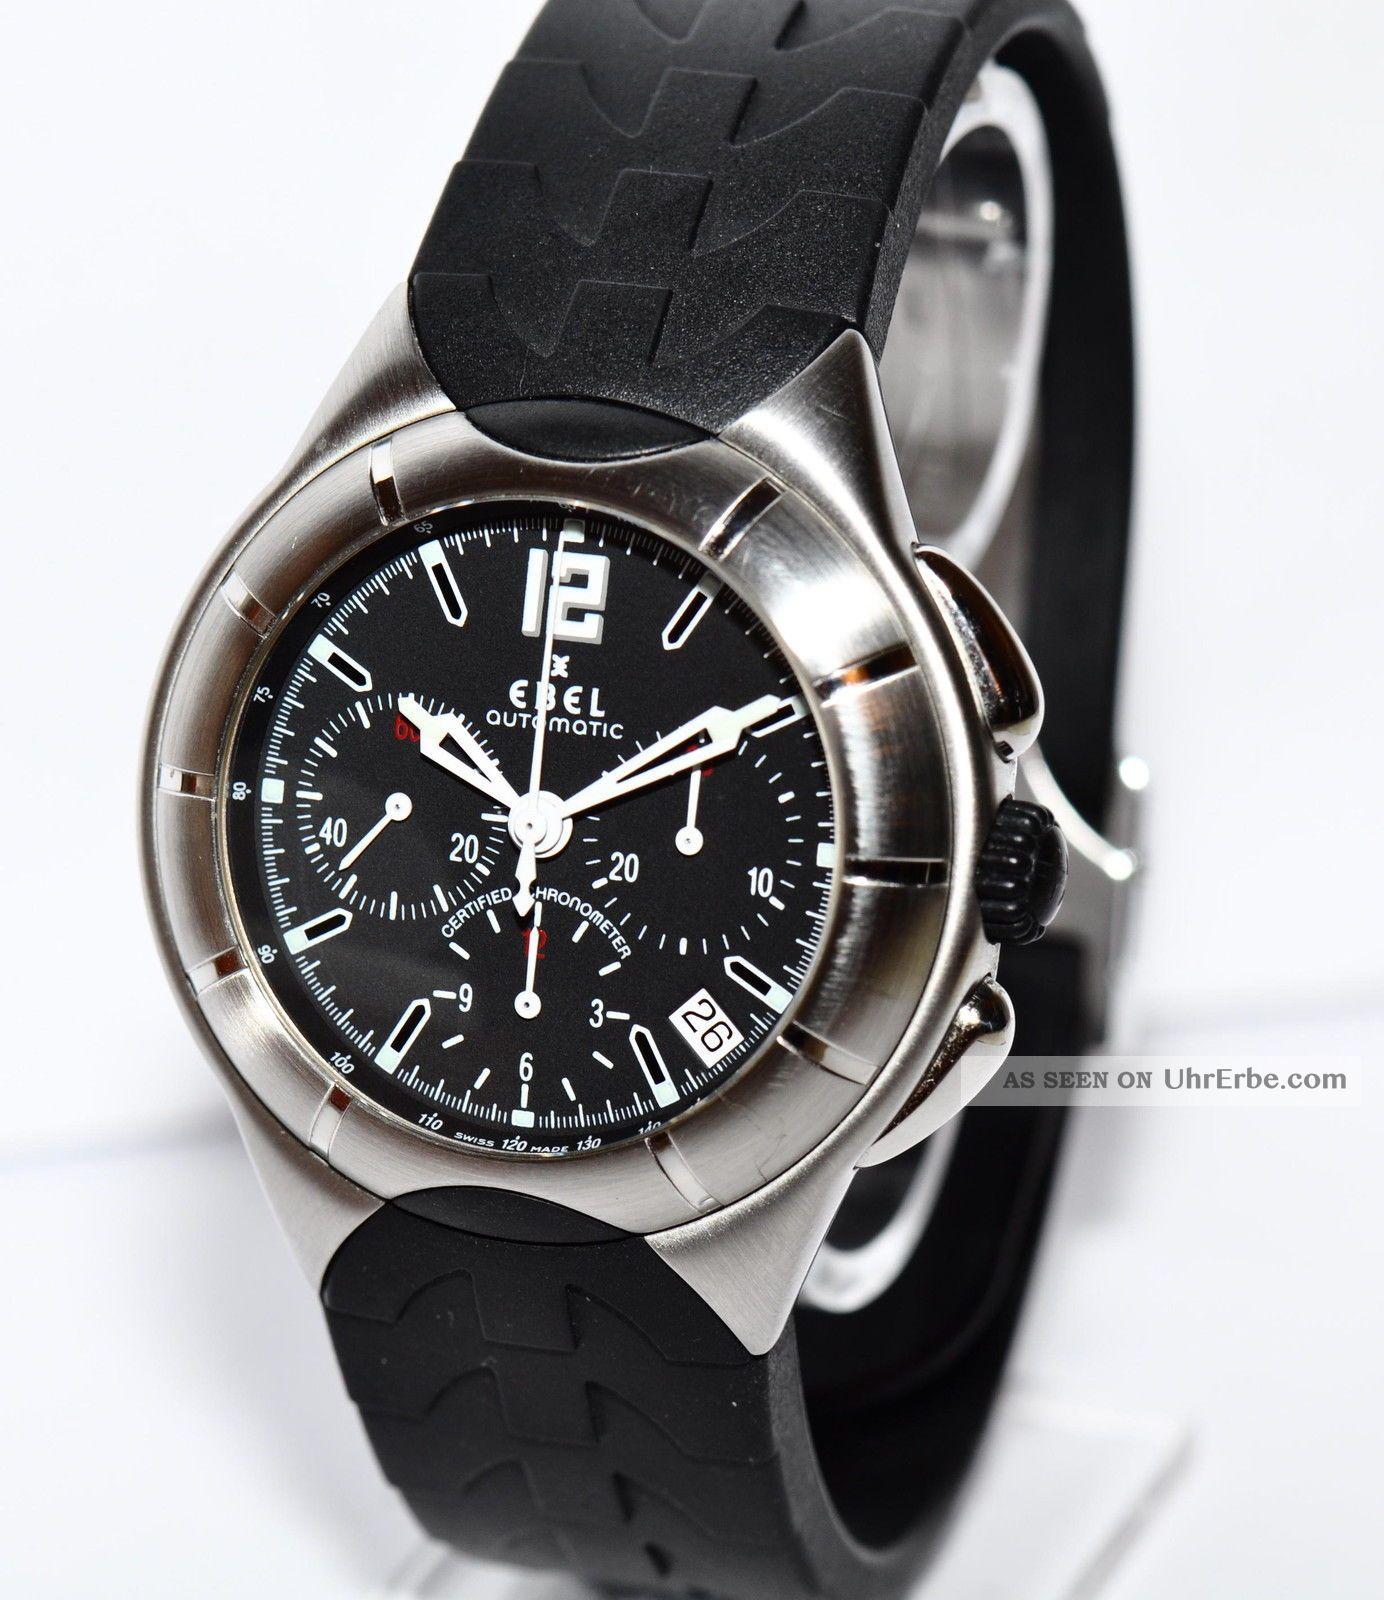 Ebel Type – E Stahl Kautschuk Uhr Ref.  9137c51 Papiere Box 2013 Armbanduhren Bild